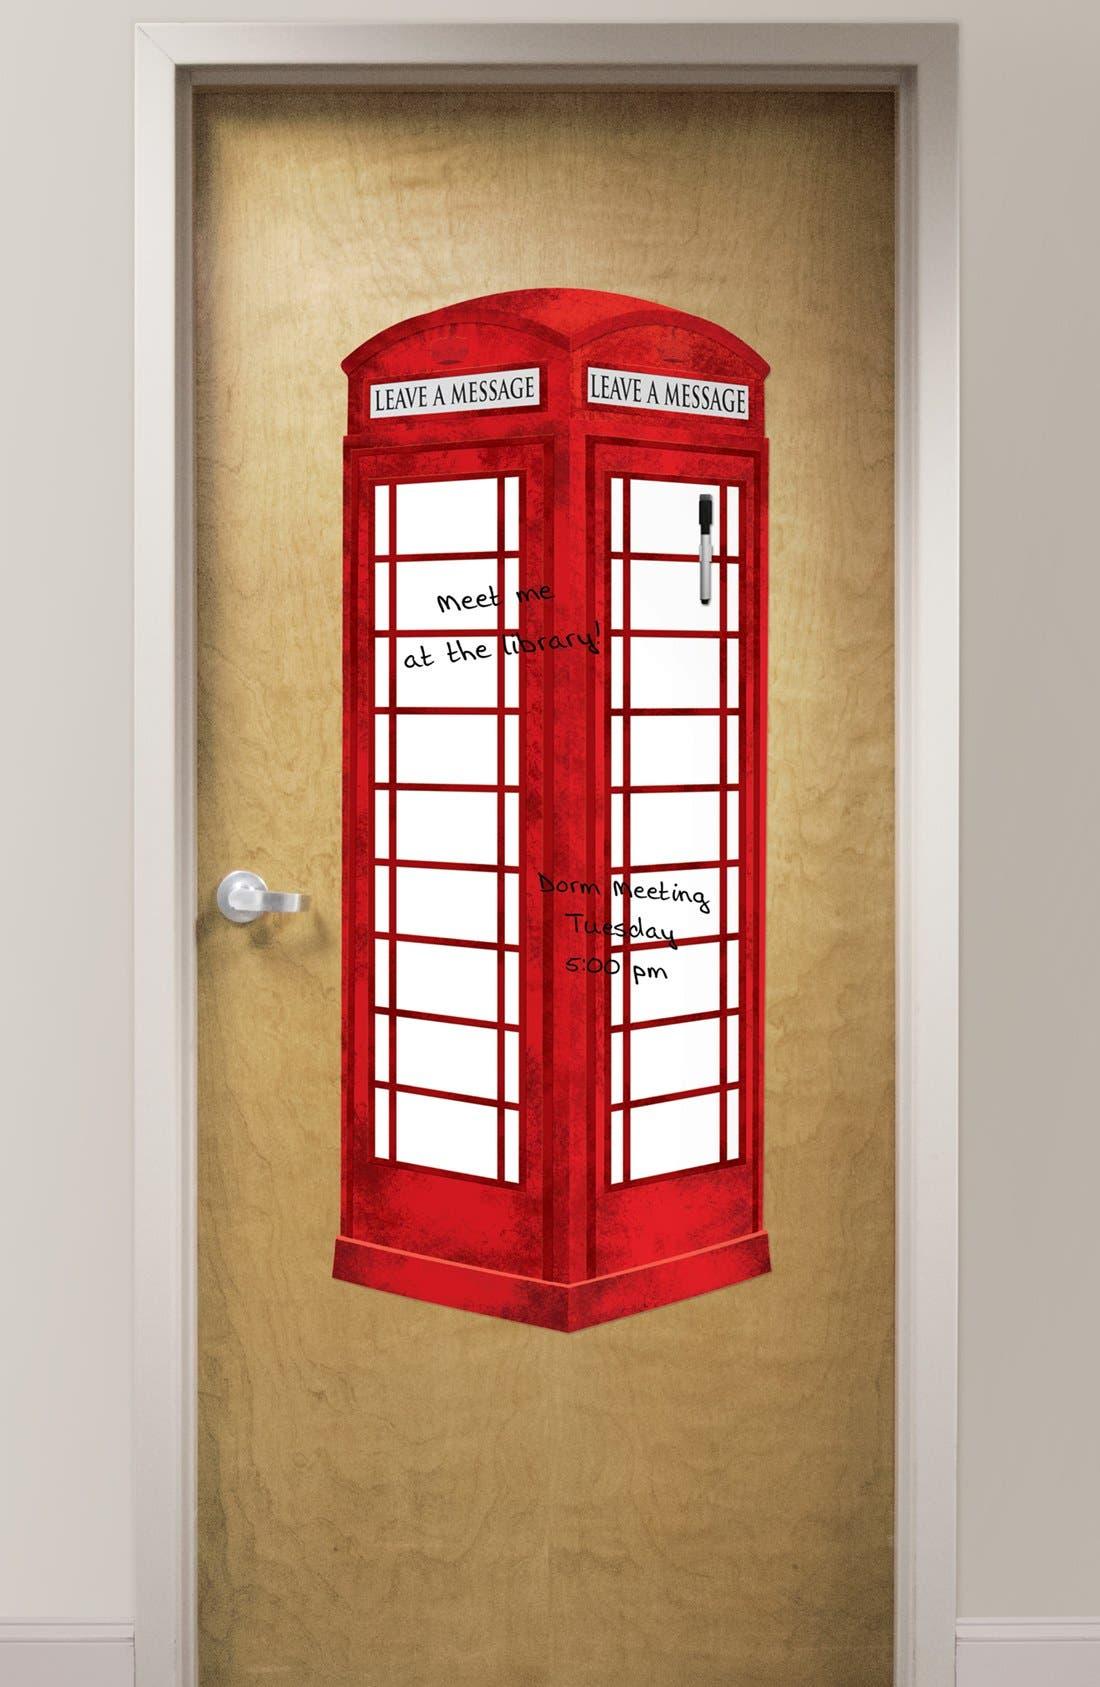 Main Image - Wallpops London Phone Booth Dry Erase Board